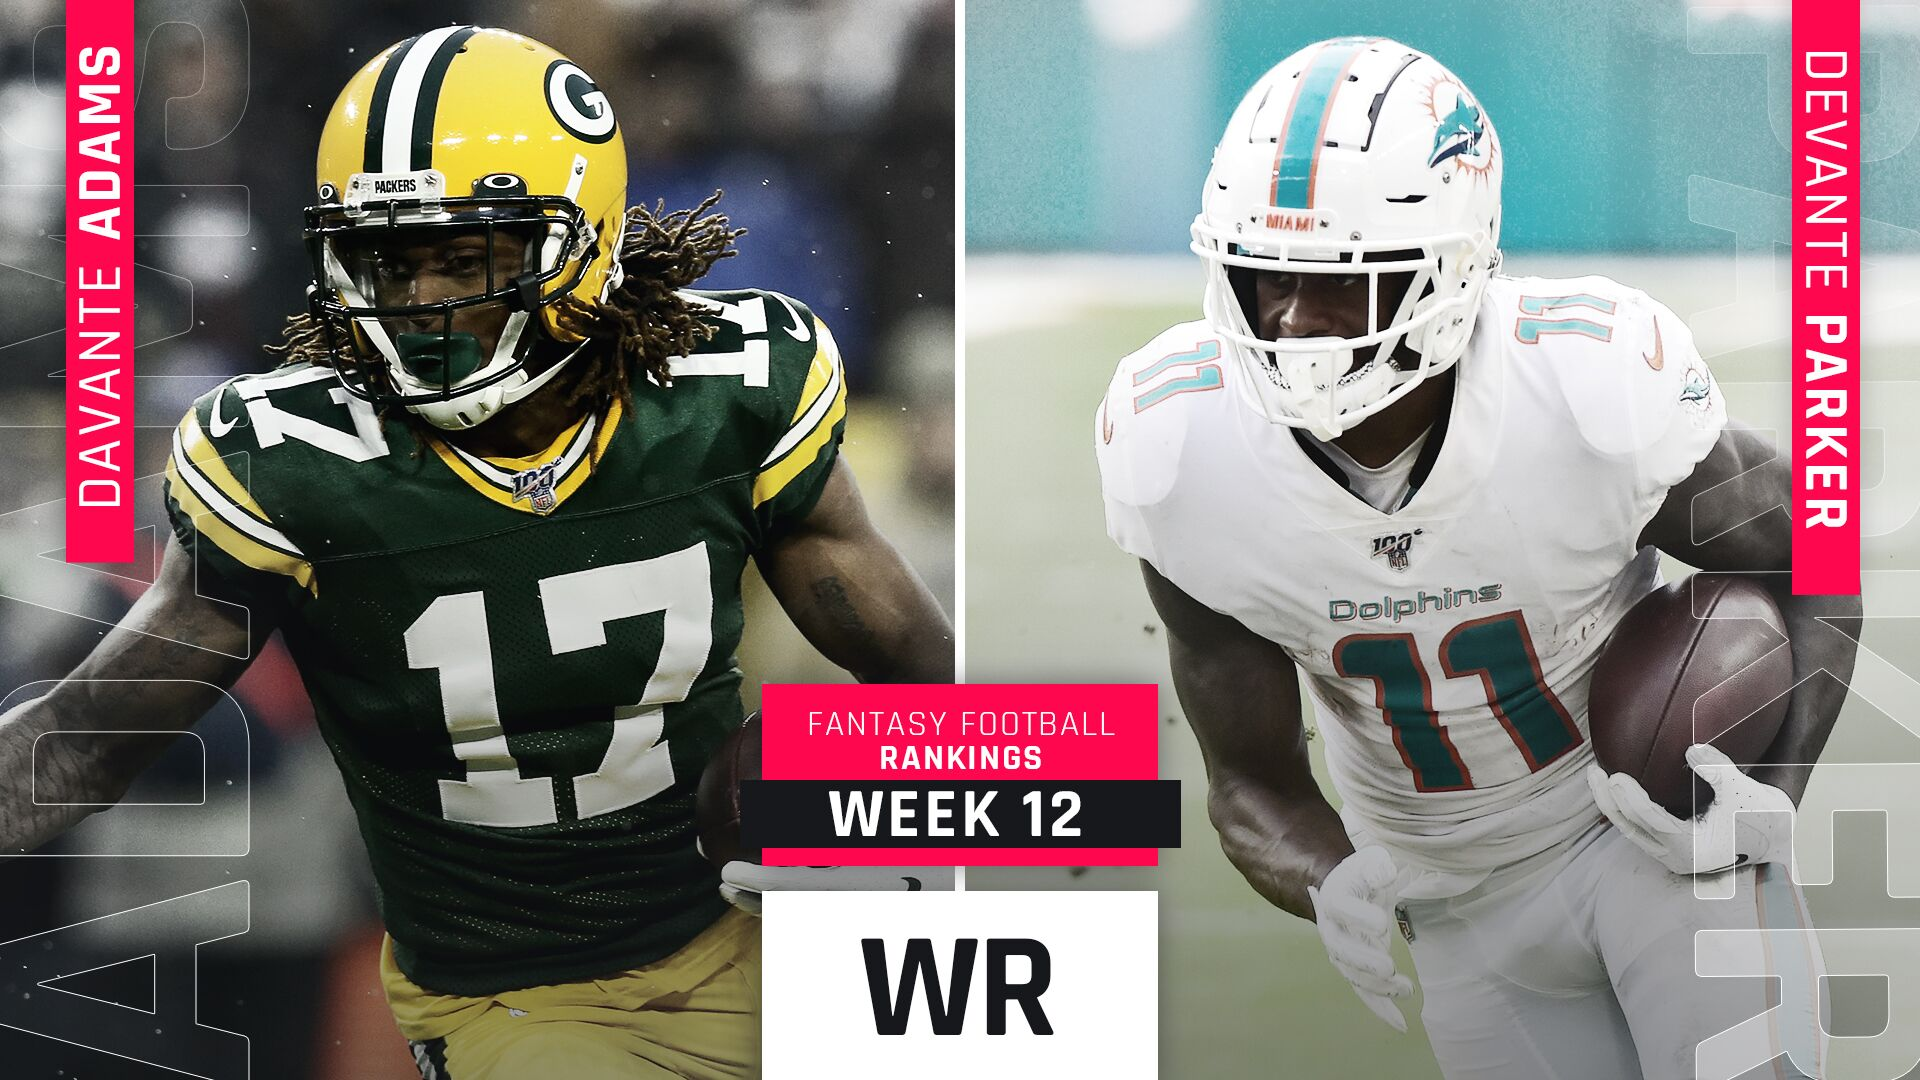 Week 12 Fantasy WR Rankings: Chris Godwin, Mike Evans both top-five receivers